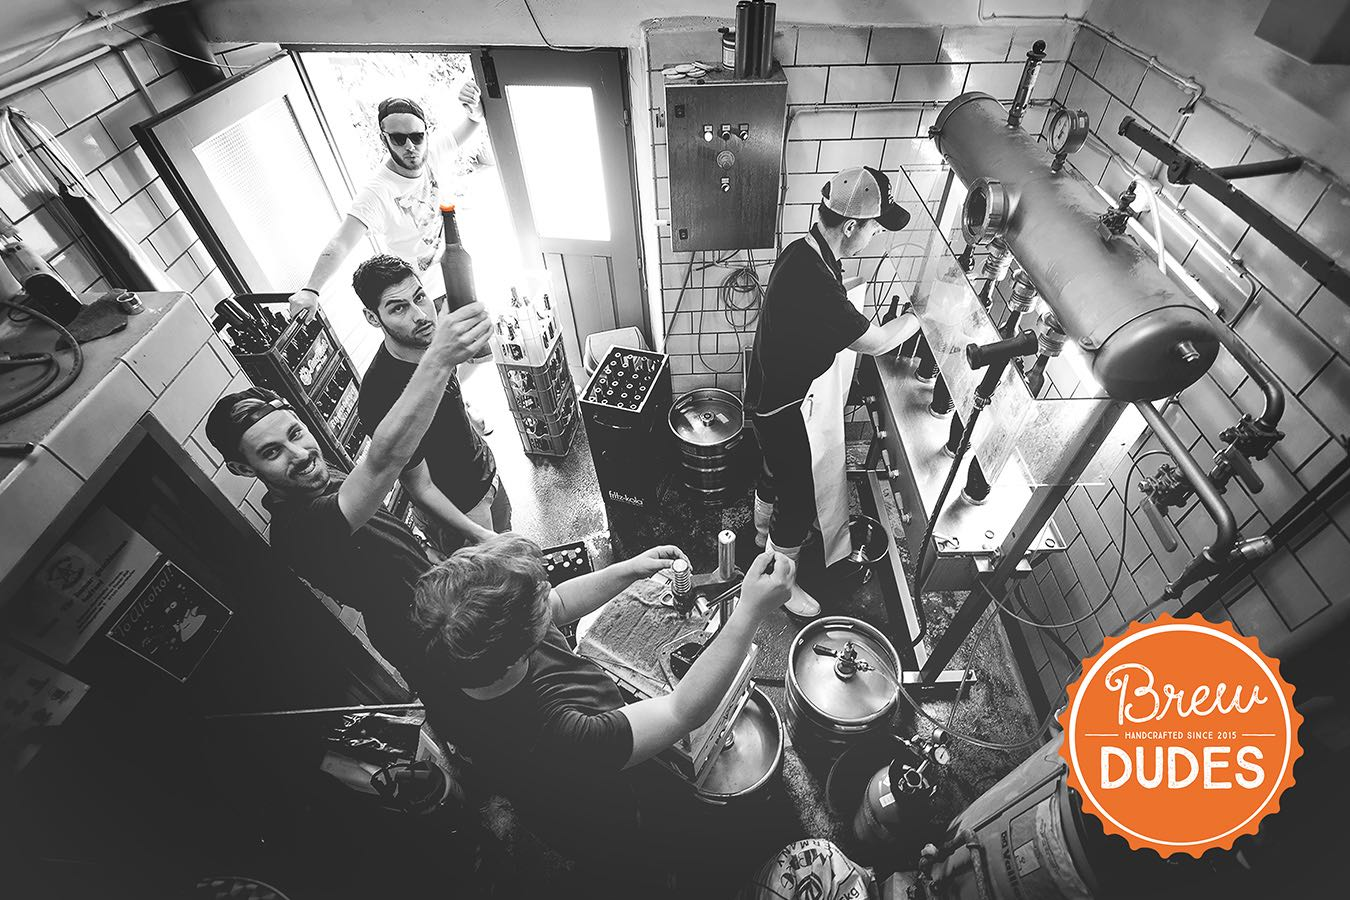 Makers: Brew Dudes